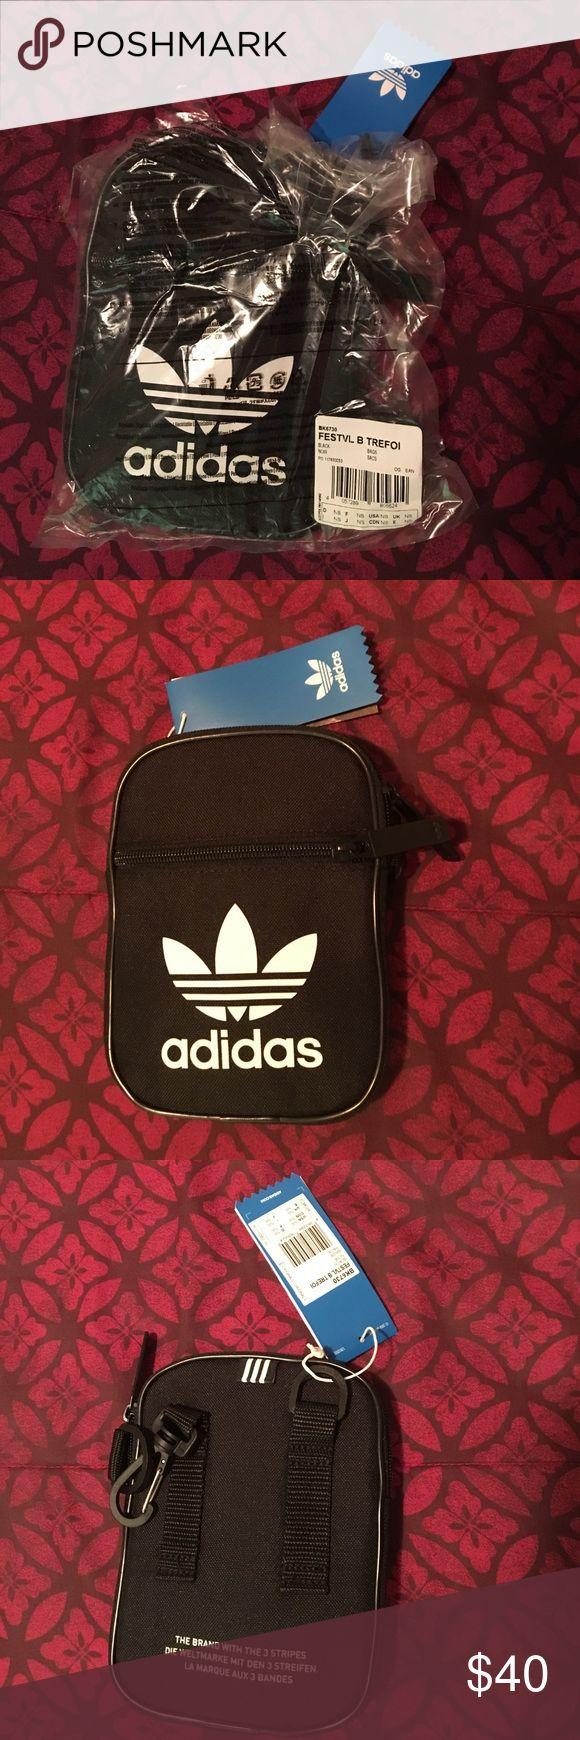 Adidas Fanny Pack/Festival Bag Brand New Festival Multi Way Bag w/ Trefoil Logo adidas Bags